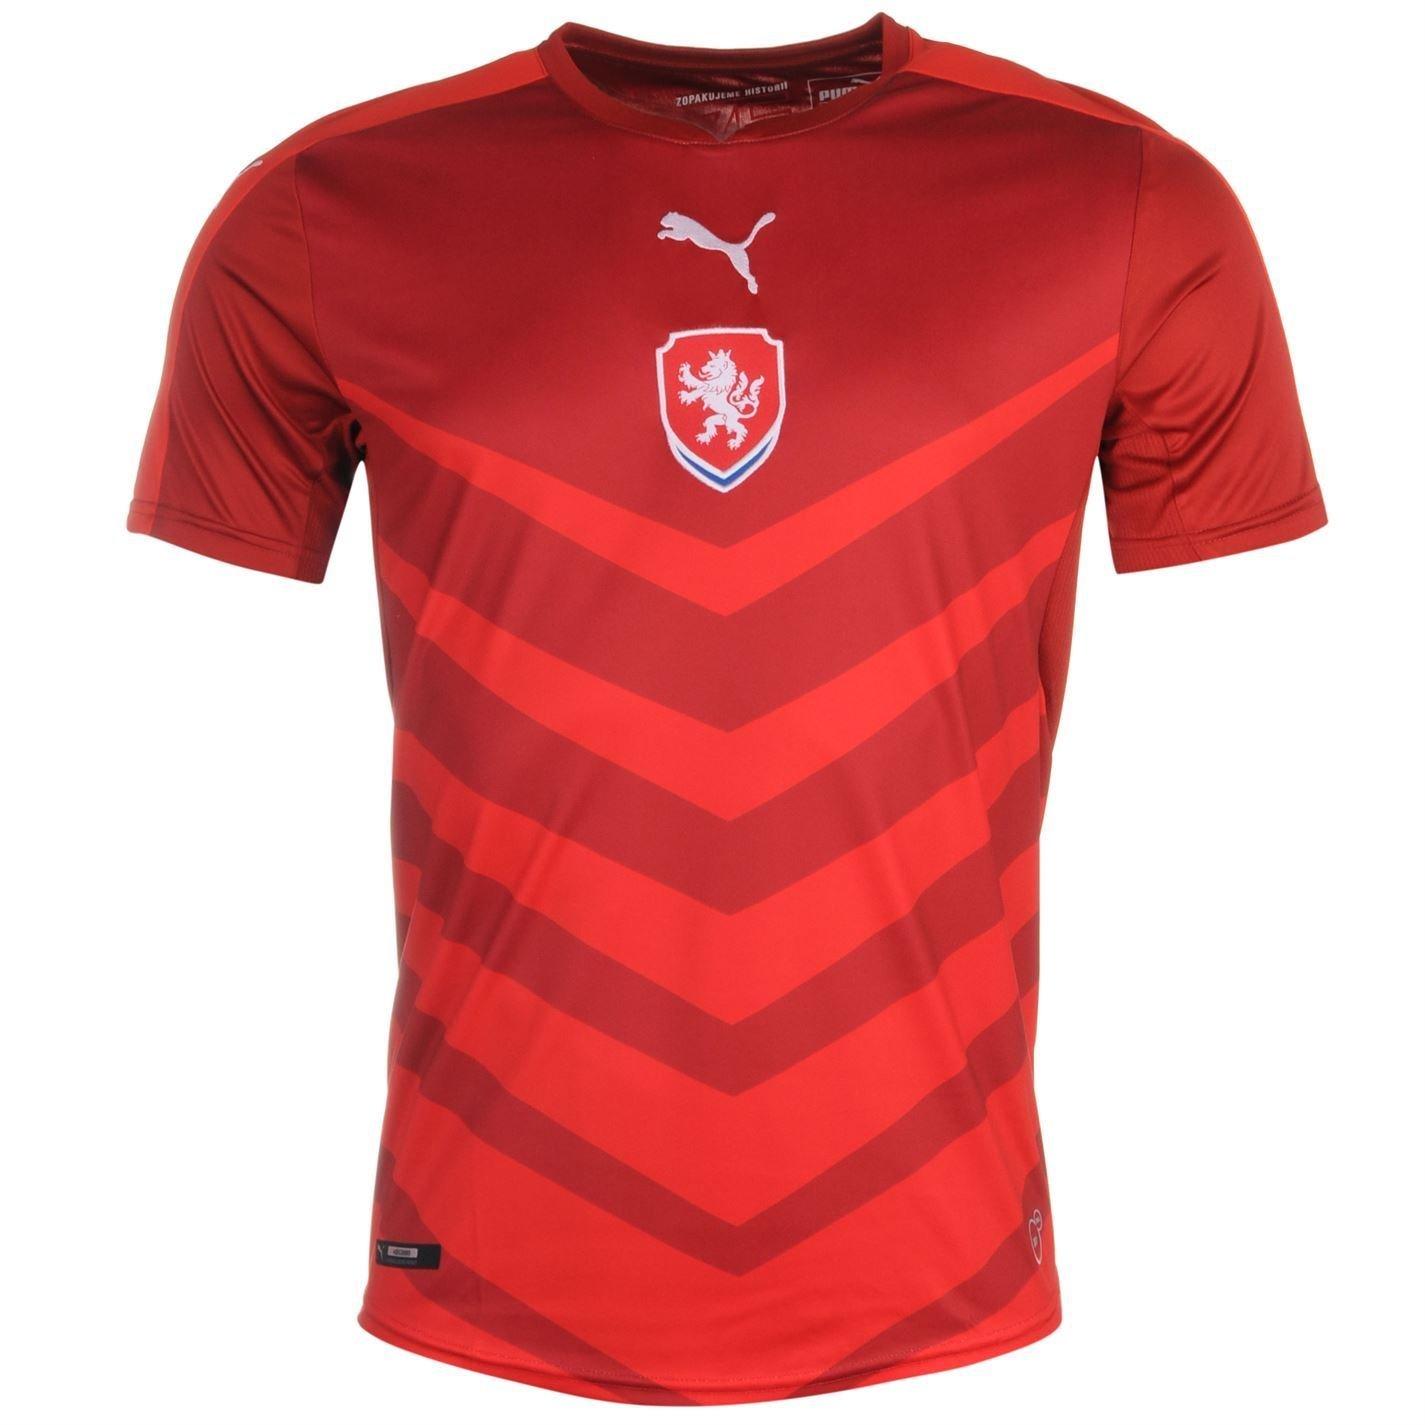 Puma Czech Republic Home Jersey 2016メンズレッド/ Chili Footballサッカーシャツトップ B01GKD5IXYXX-Large